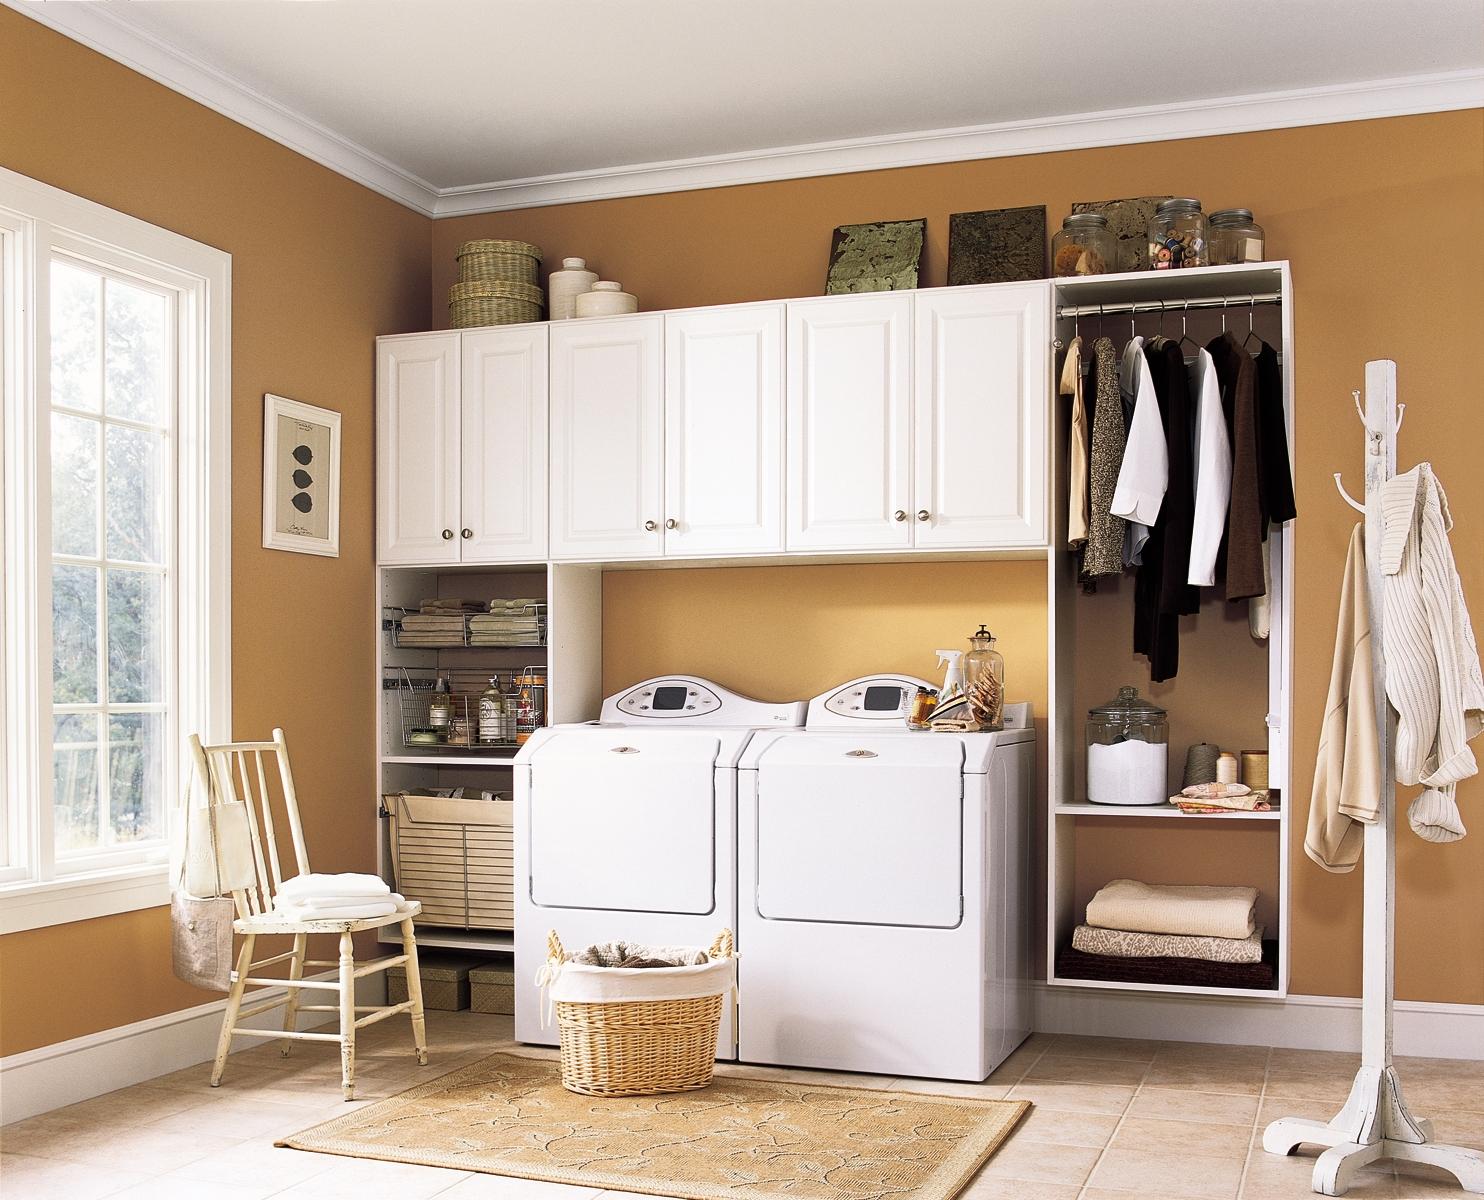 I Dream of Laundry Rooms  Apartments i Like blog